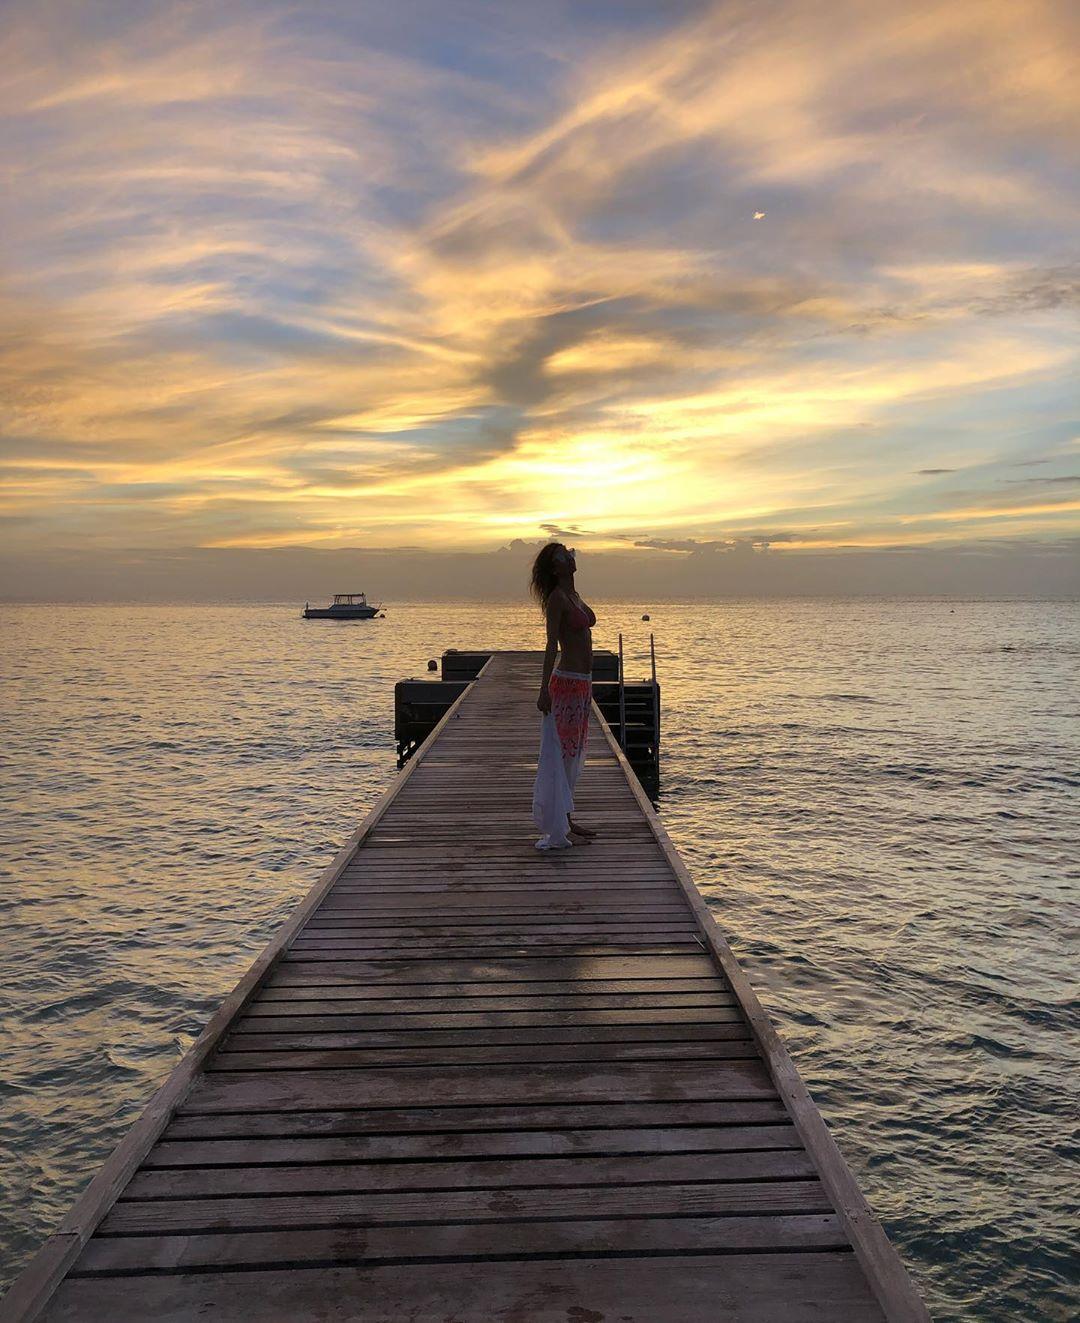 Apresentadora faz relato sobre saudades durante isolamento social: '